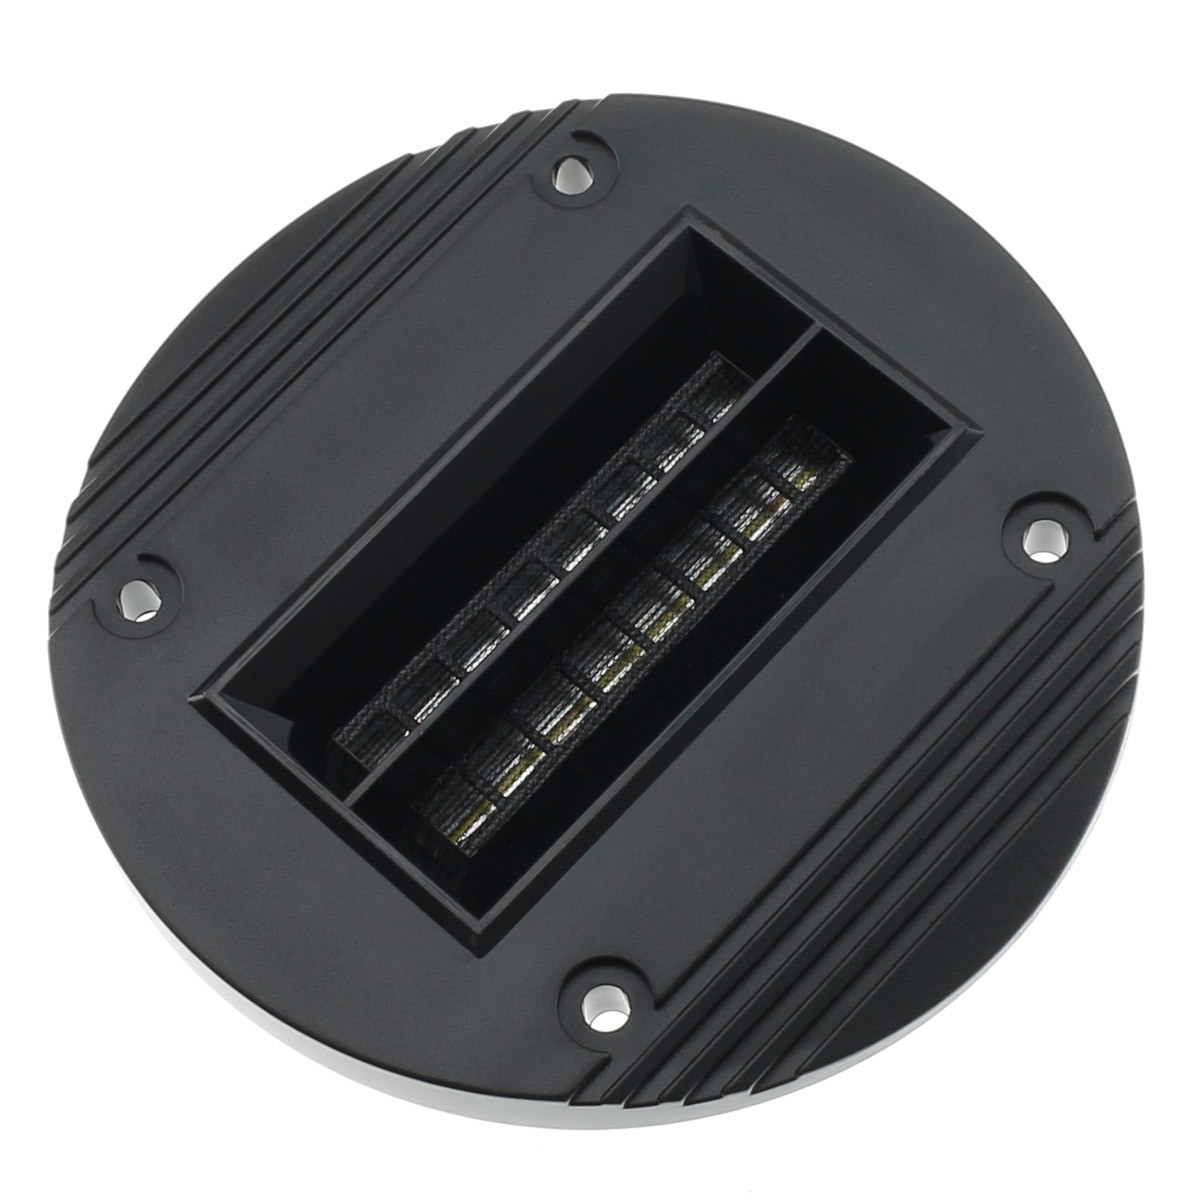 MONACOR RBT-95 Speaker Driver Isodynamic Ribbon Tweeter 30W 8 Ohm 98dB